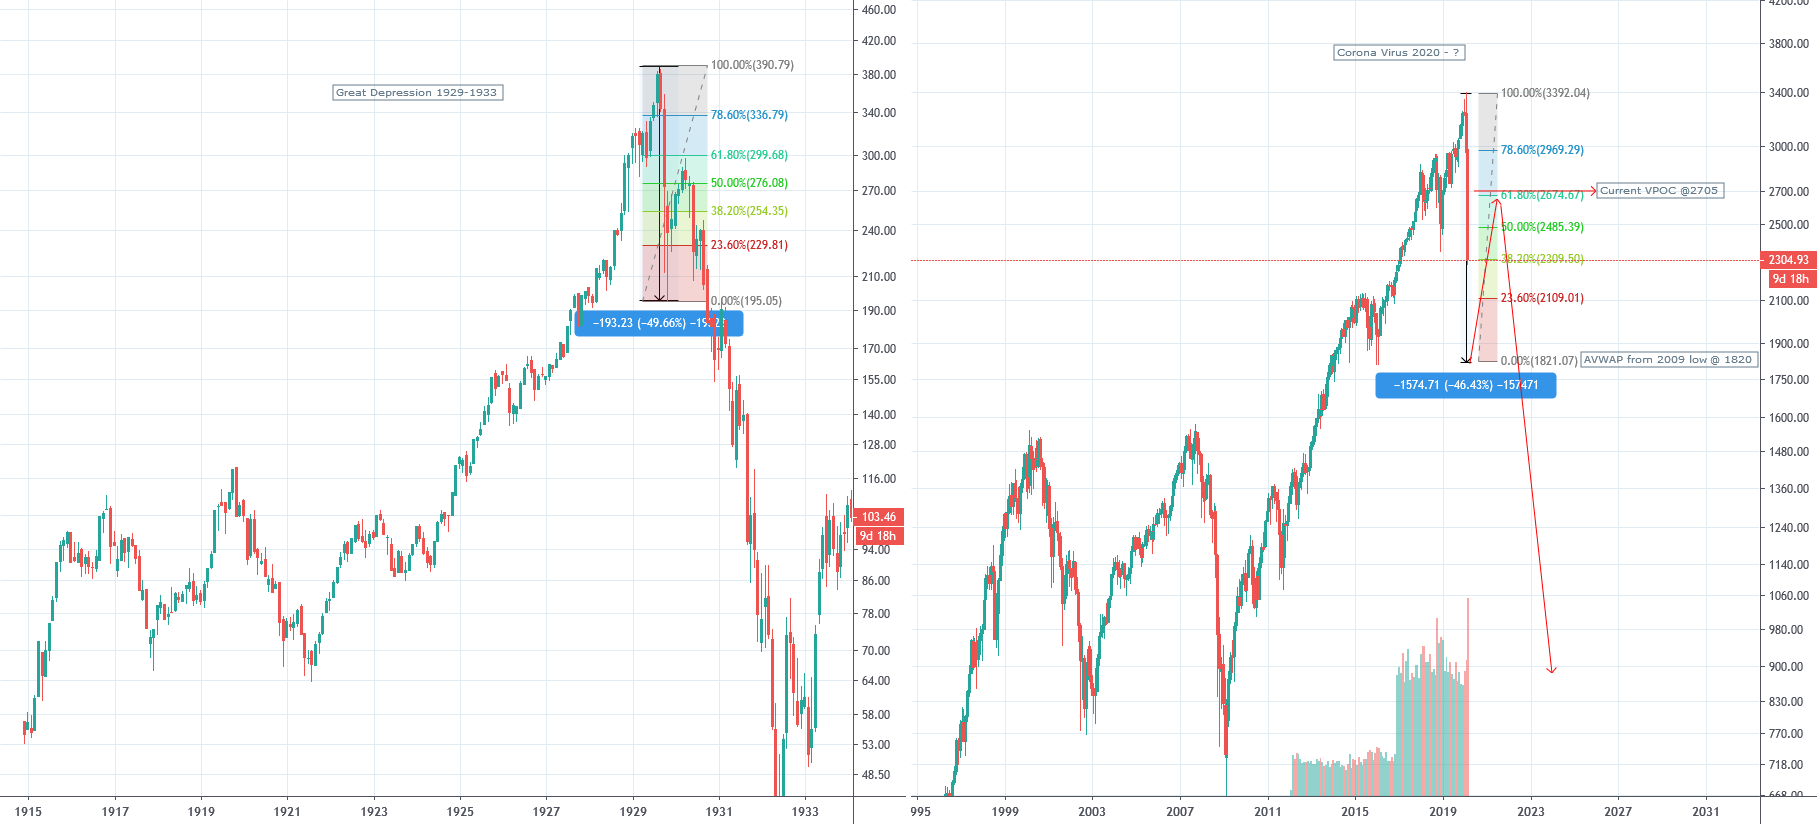 Great Depression Chart Vs S Amp P Chart